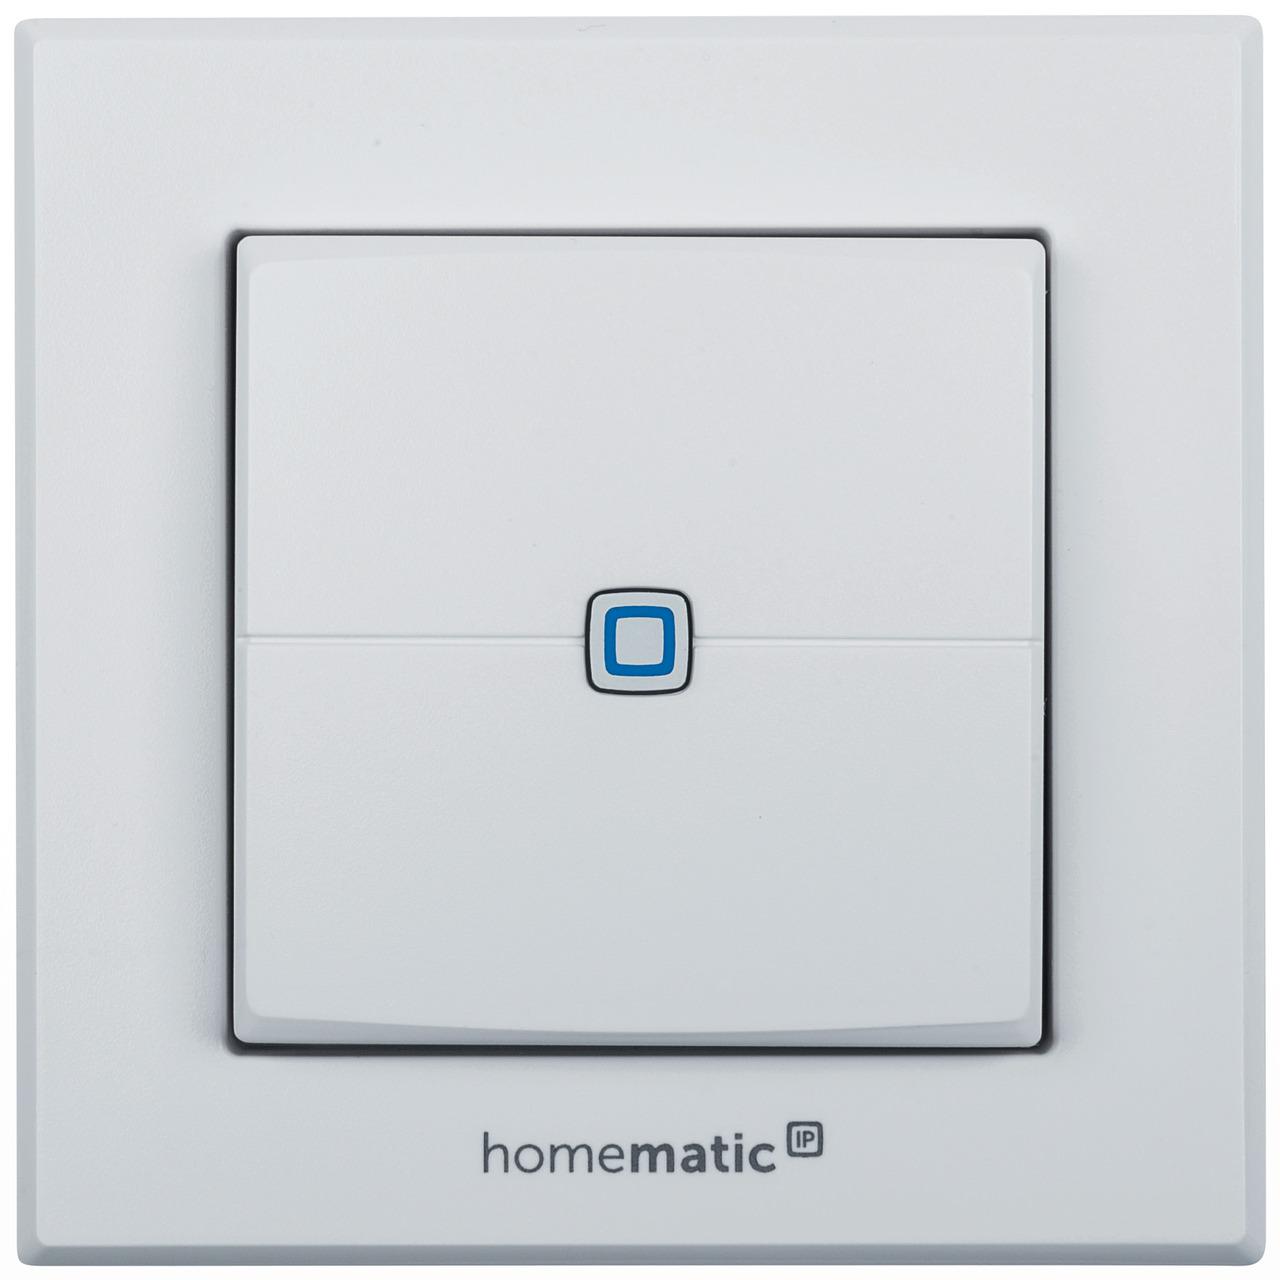 ELV Homematic IP Komplettbausatz Wandtaster HMIP-WRC2- 2-fach fund-252 r Smart Home - Hausautomation